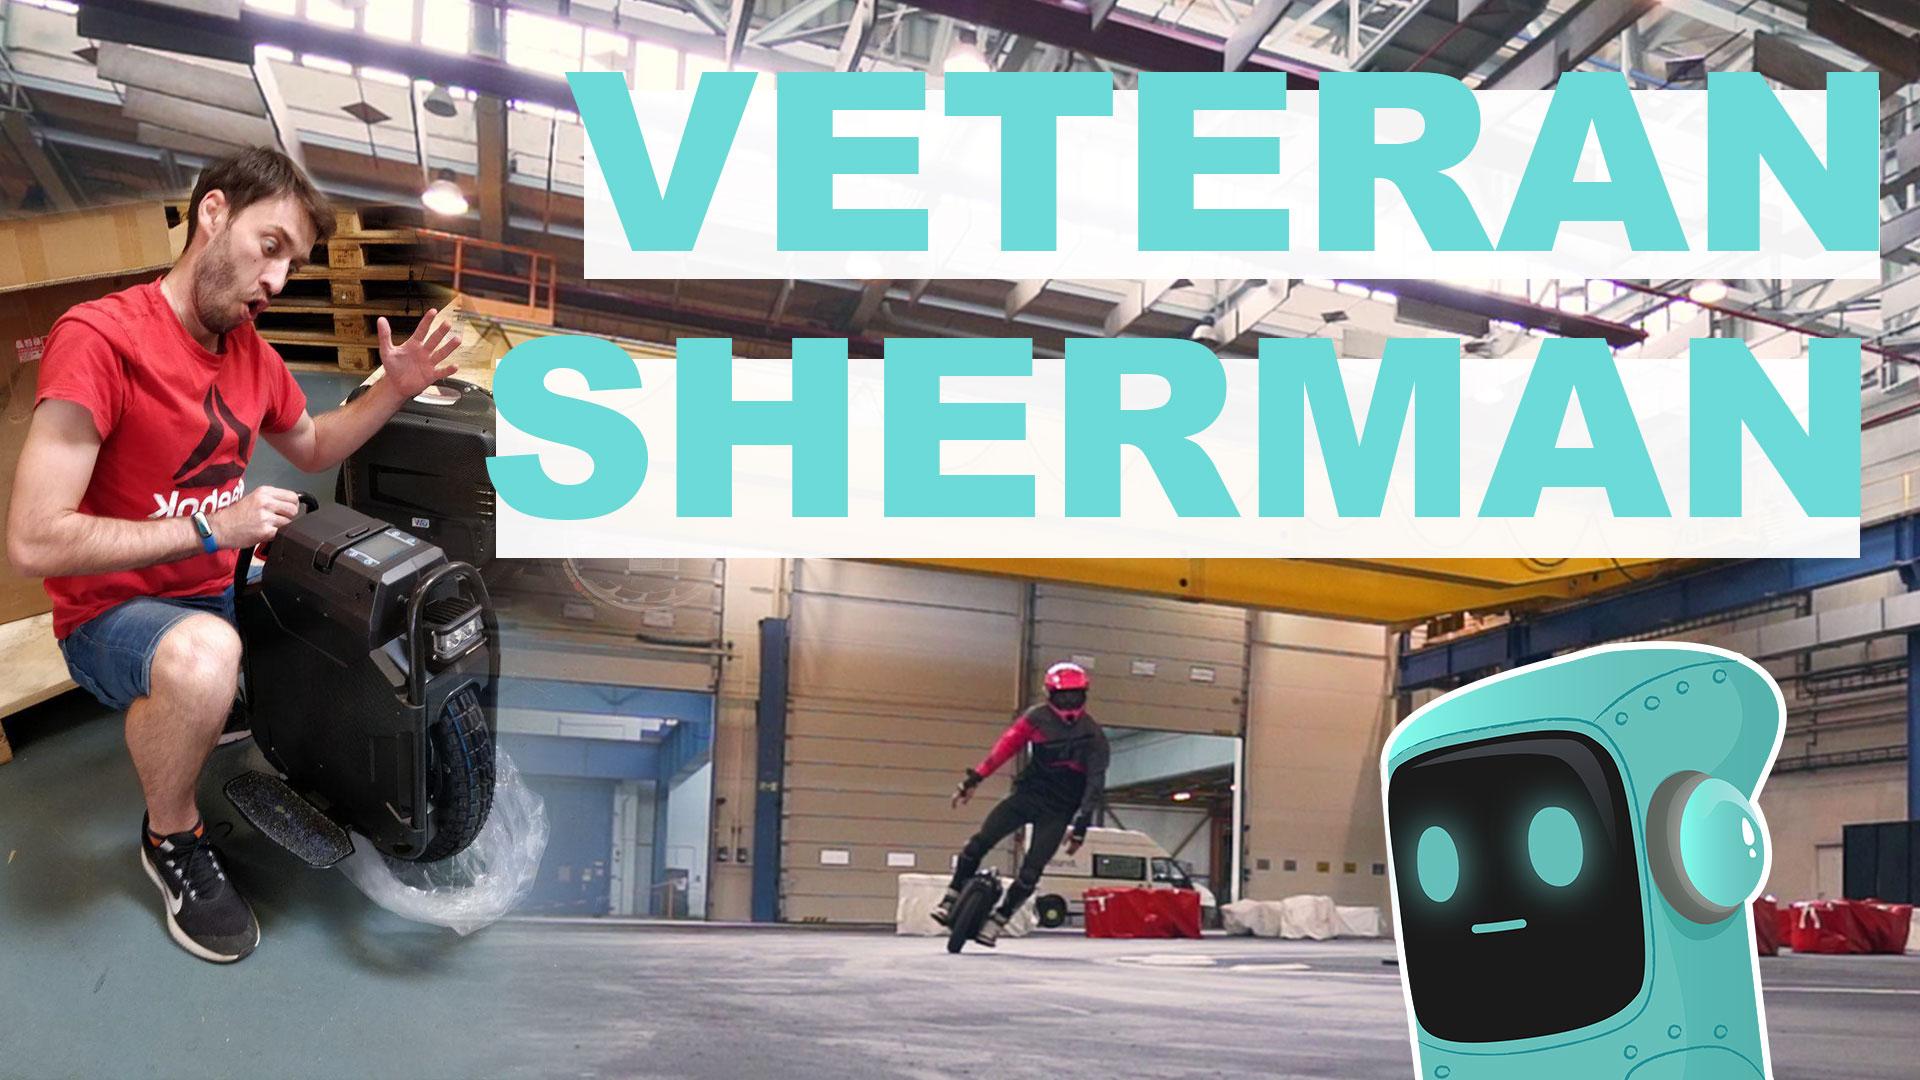 Veteran Sherman je tady. Porovnaní GotWay MSP a Veteran Sherman